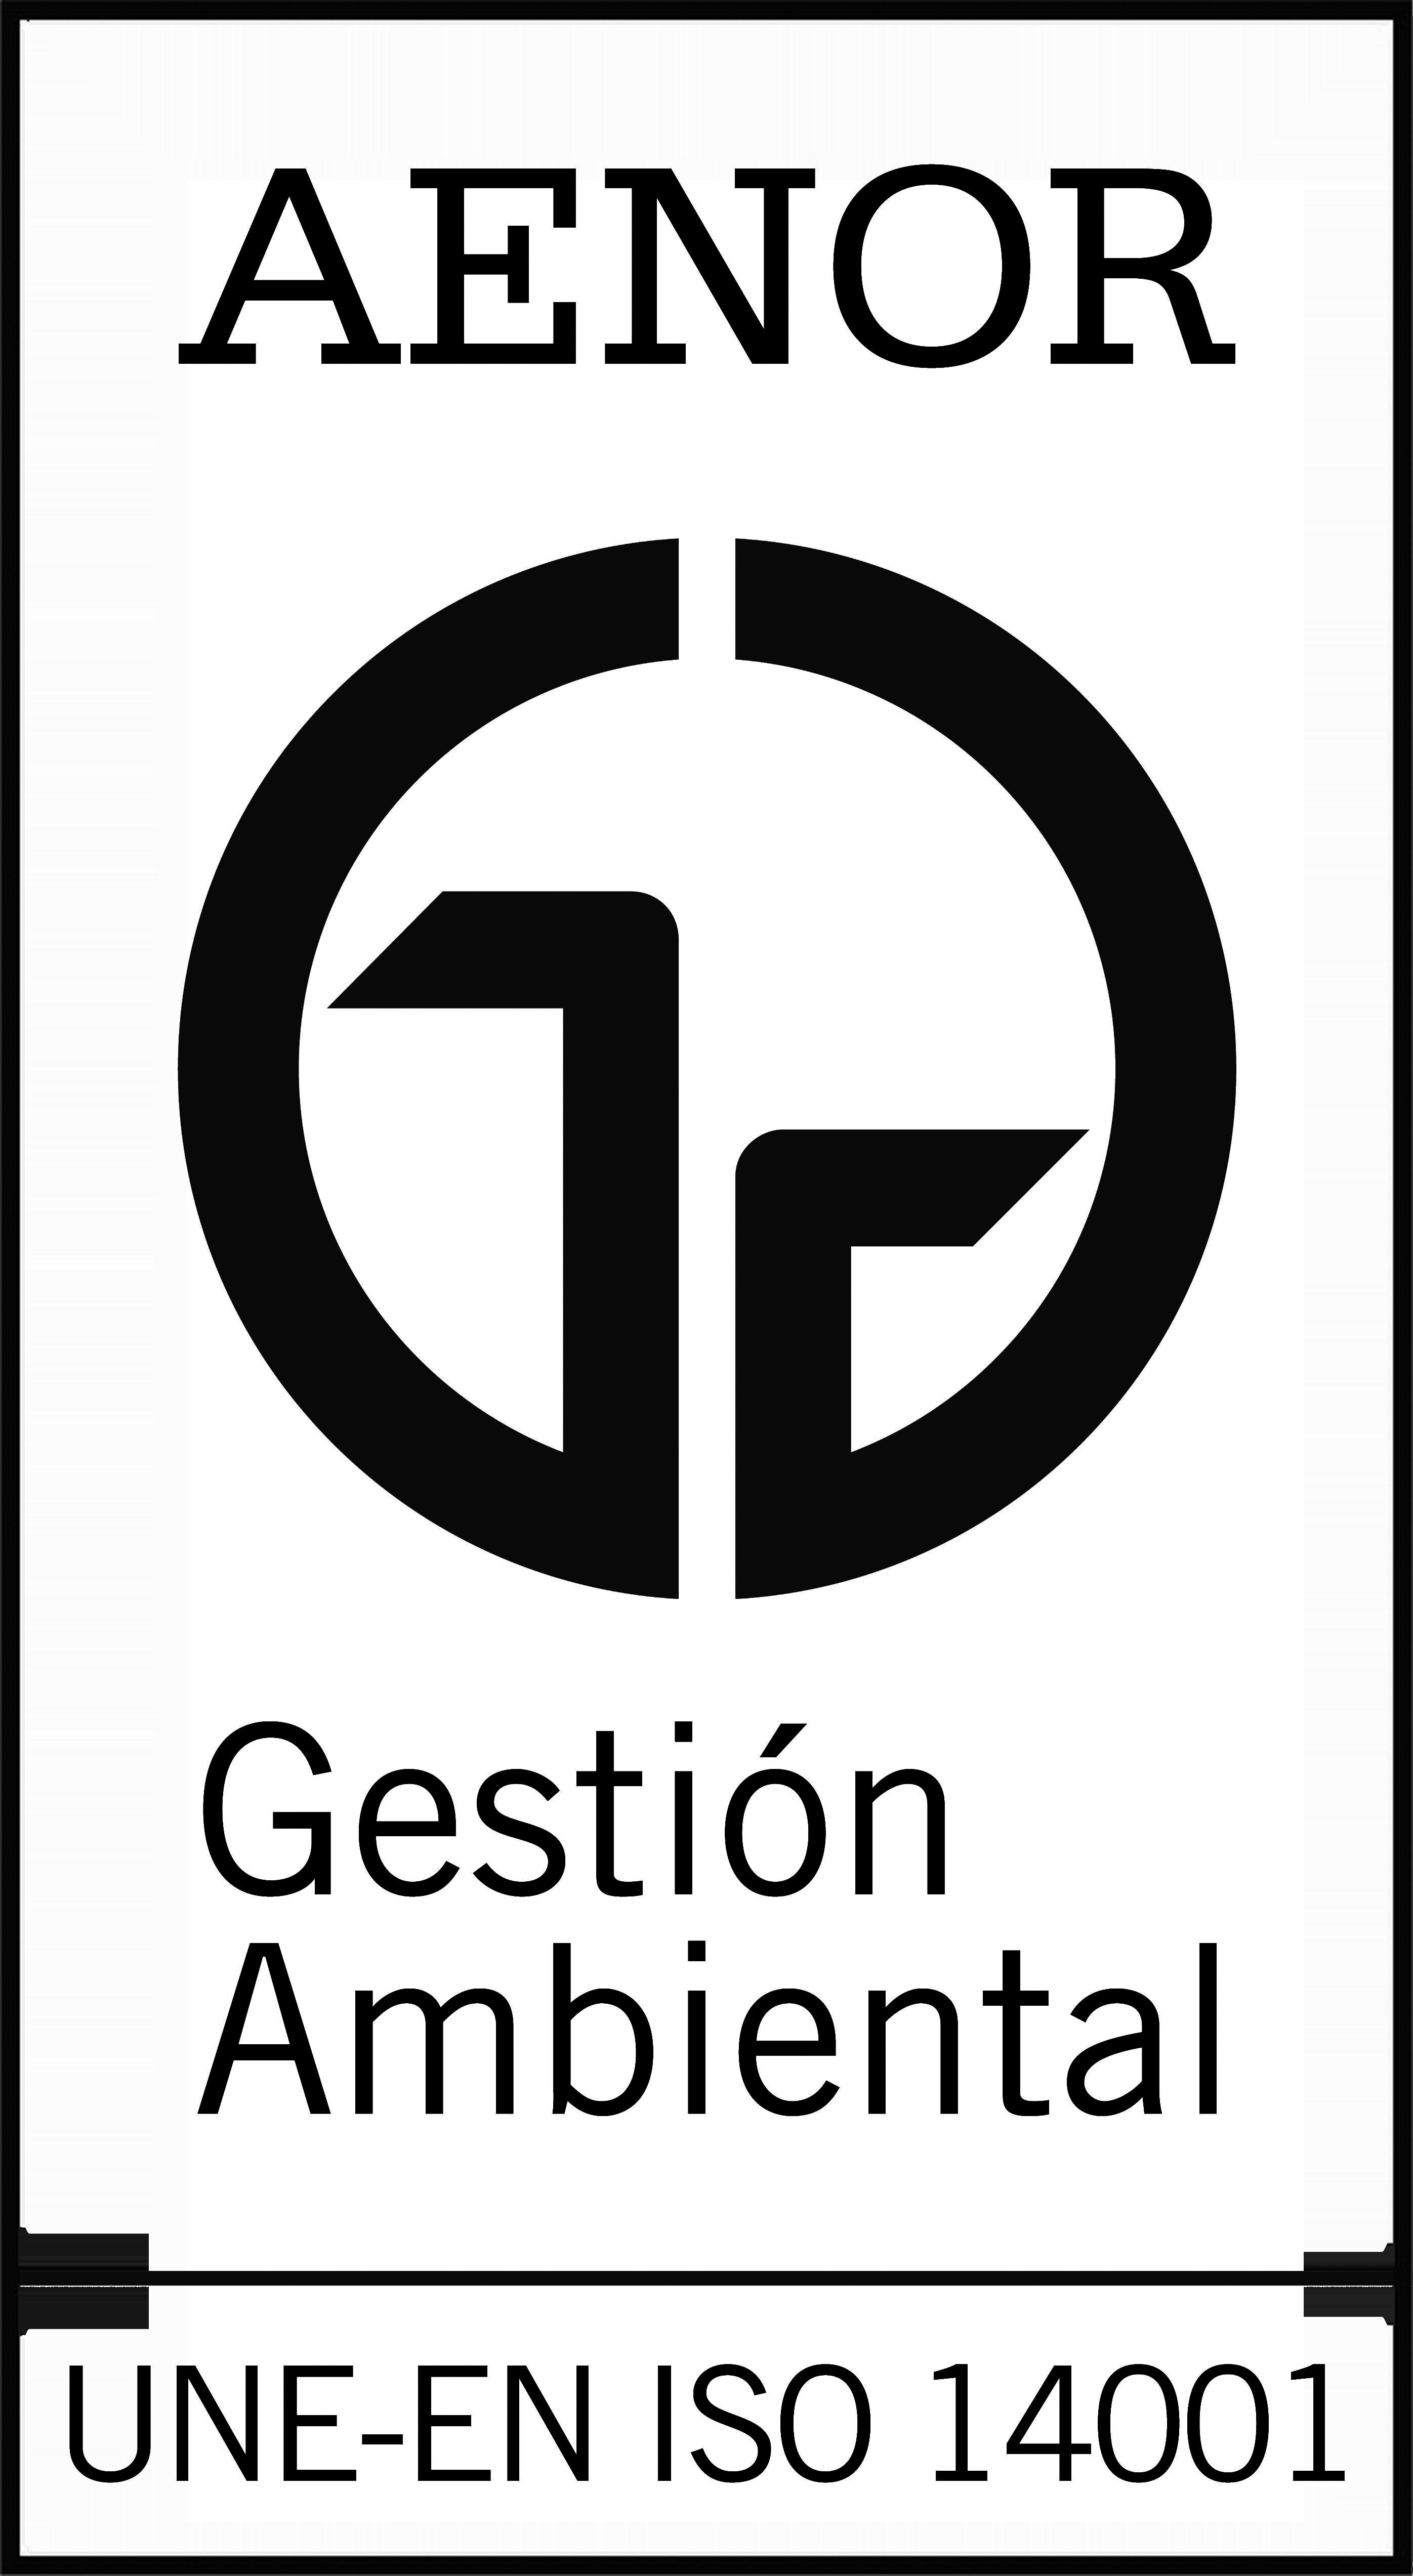 Certificates - Logo Aenor Black PNG